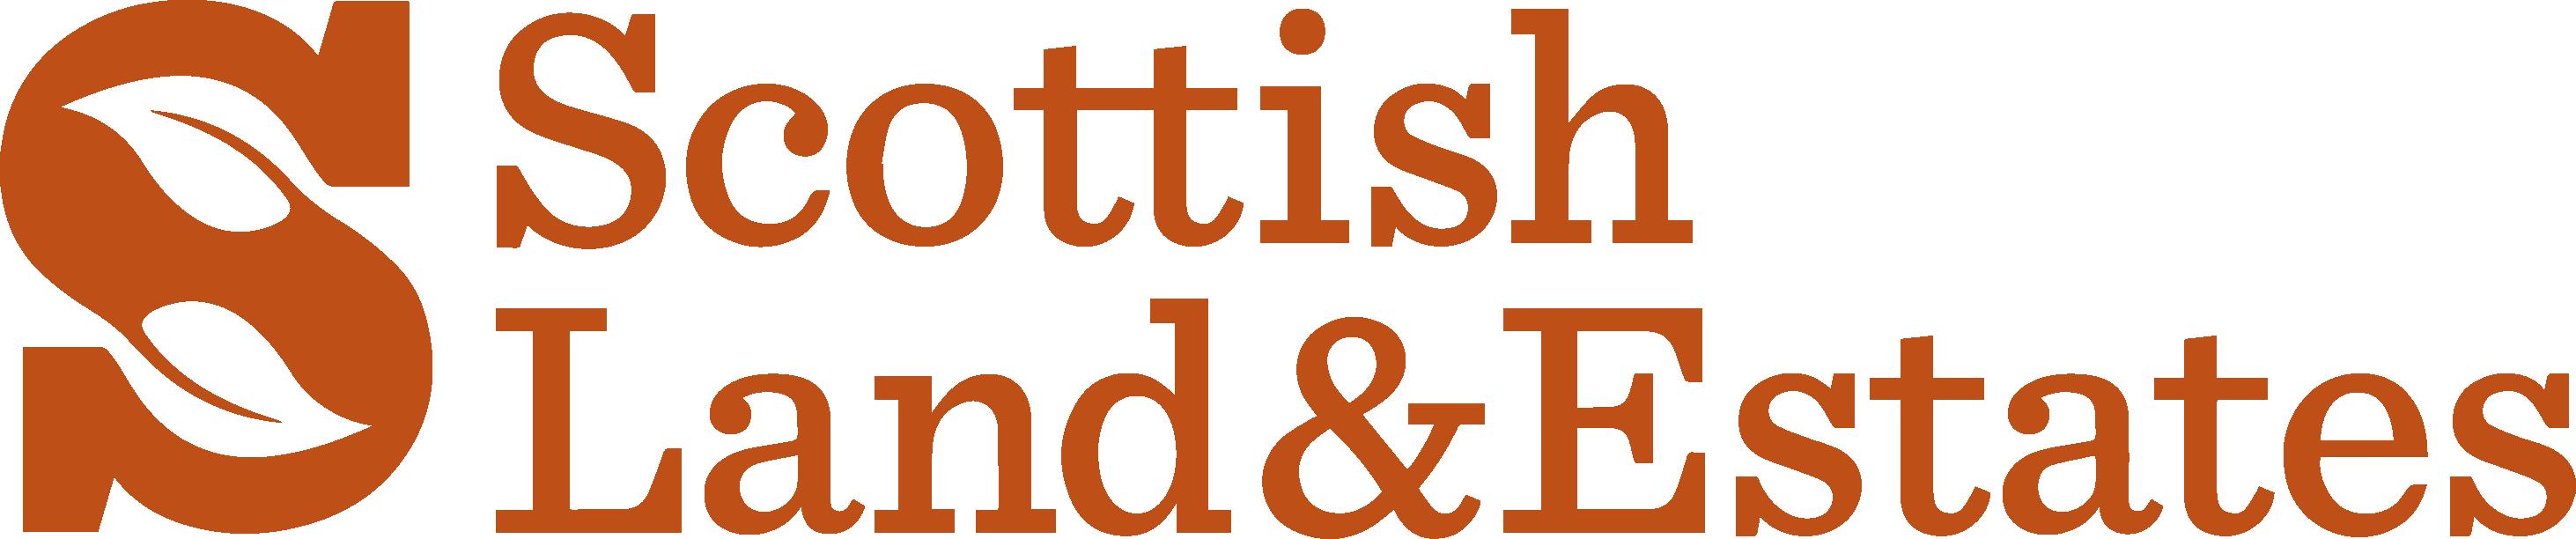 Scottish Land & Estates